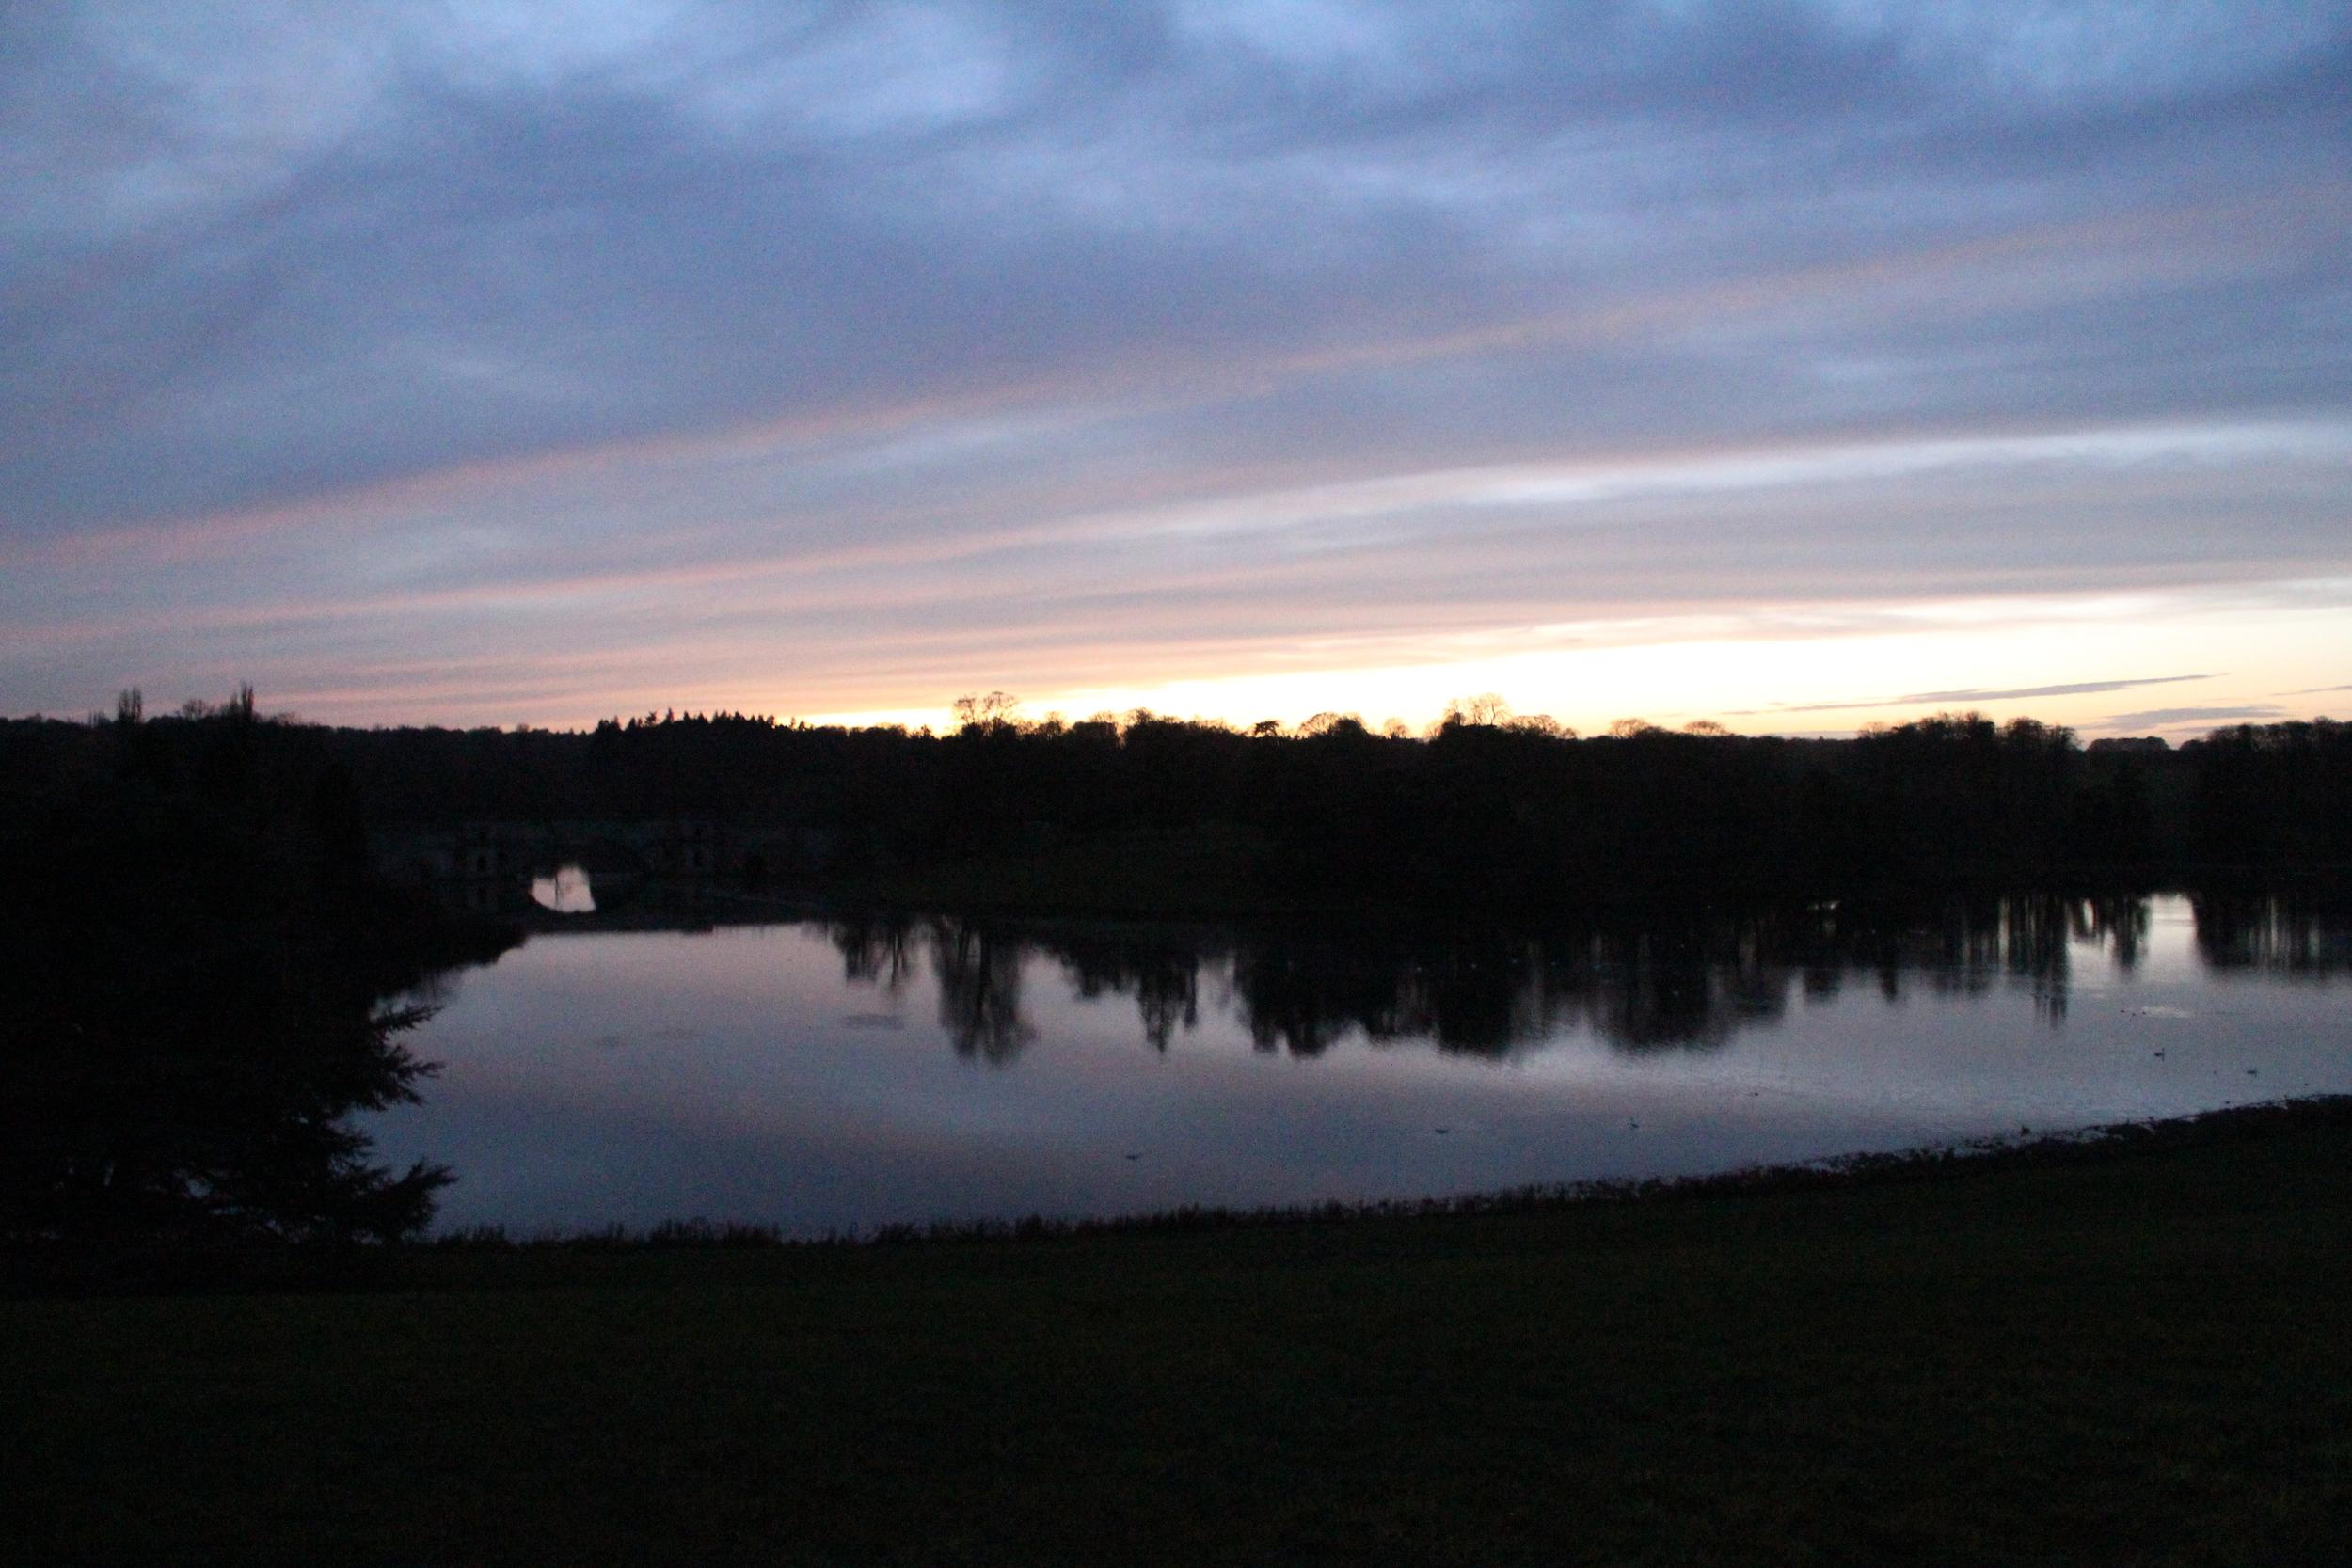 Bleinheim Palace at dusk, Woodstock, Oxfordshire, England